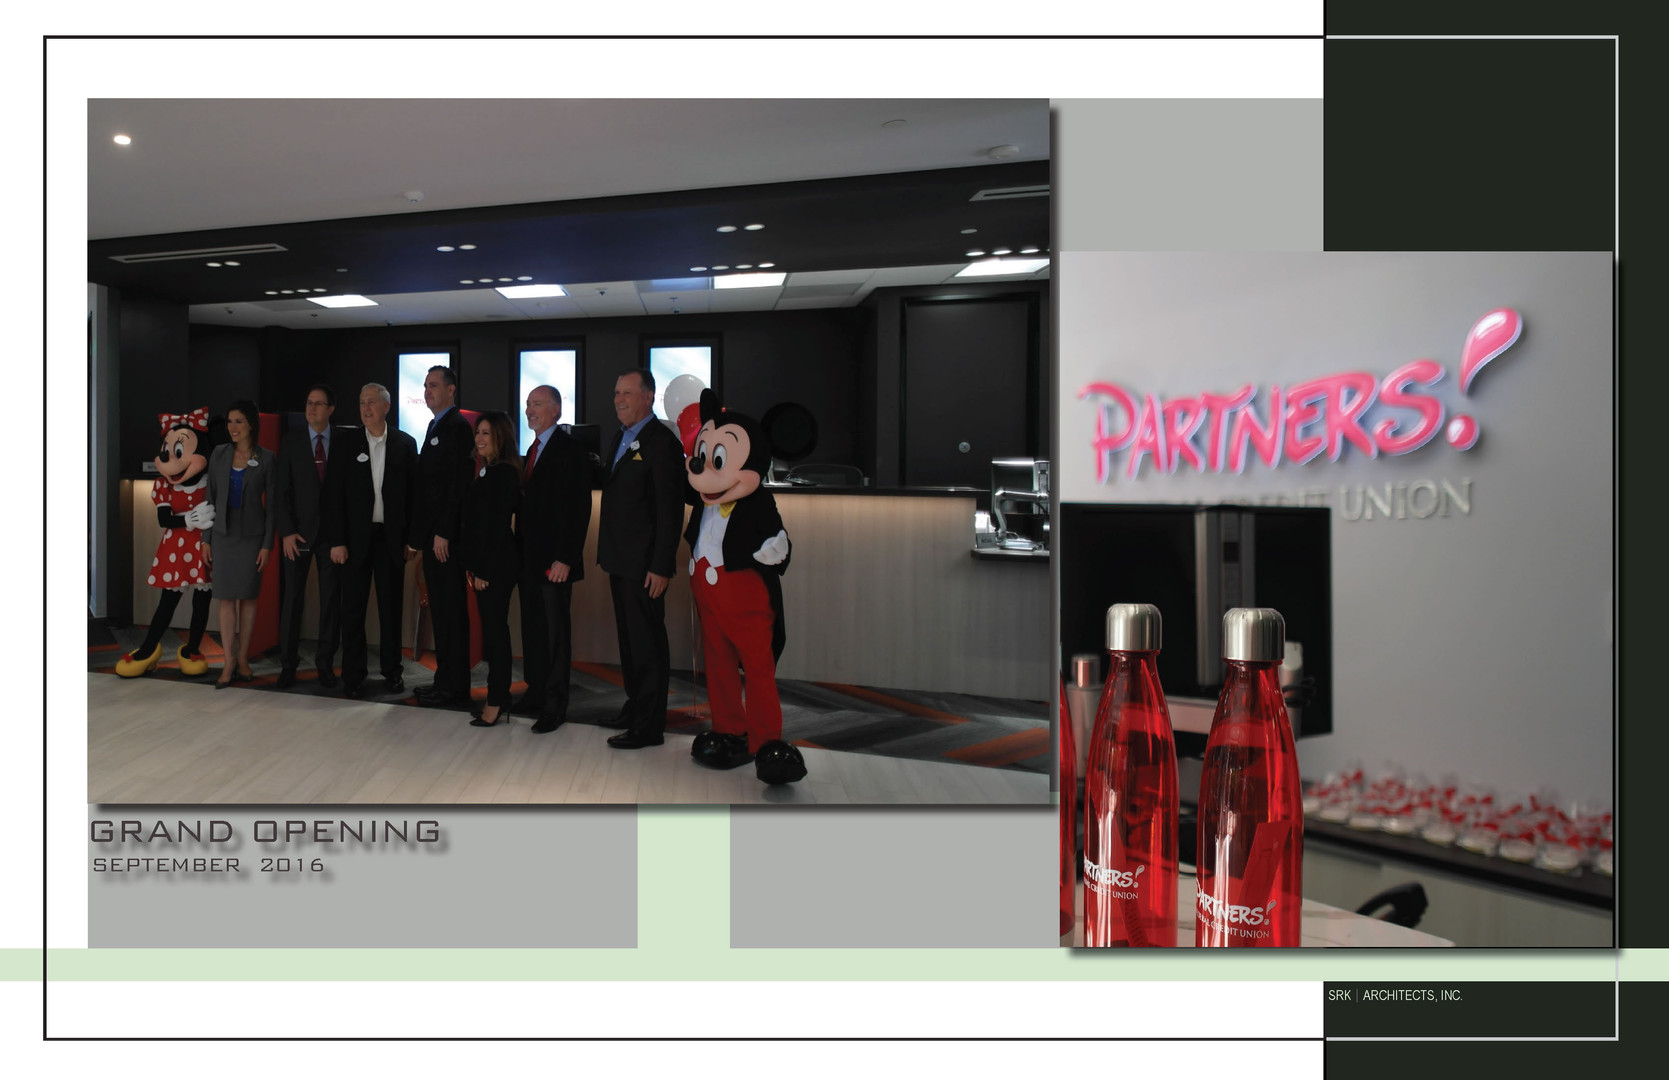 Partners Grand Opening 01.jpg